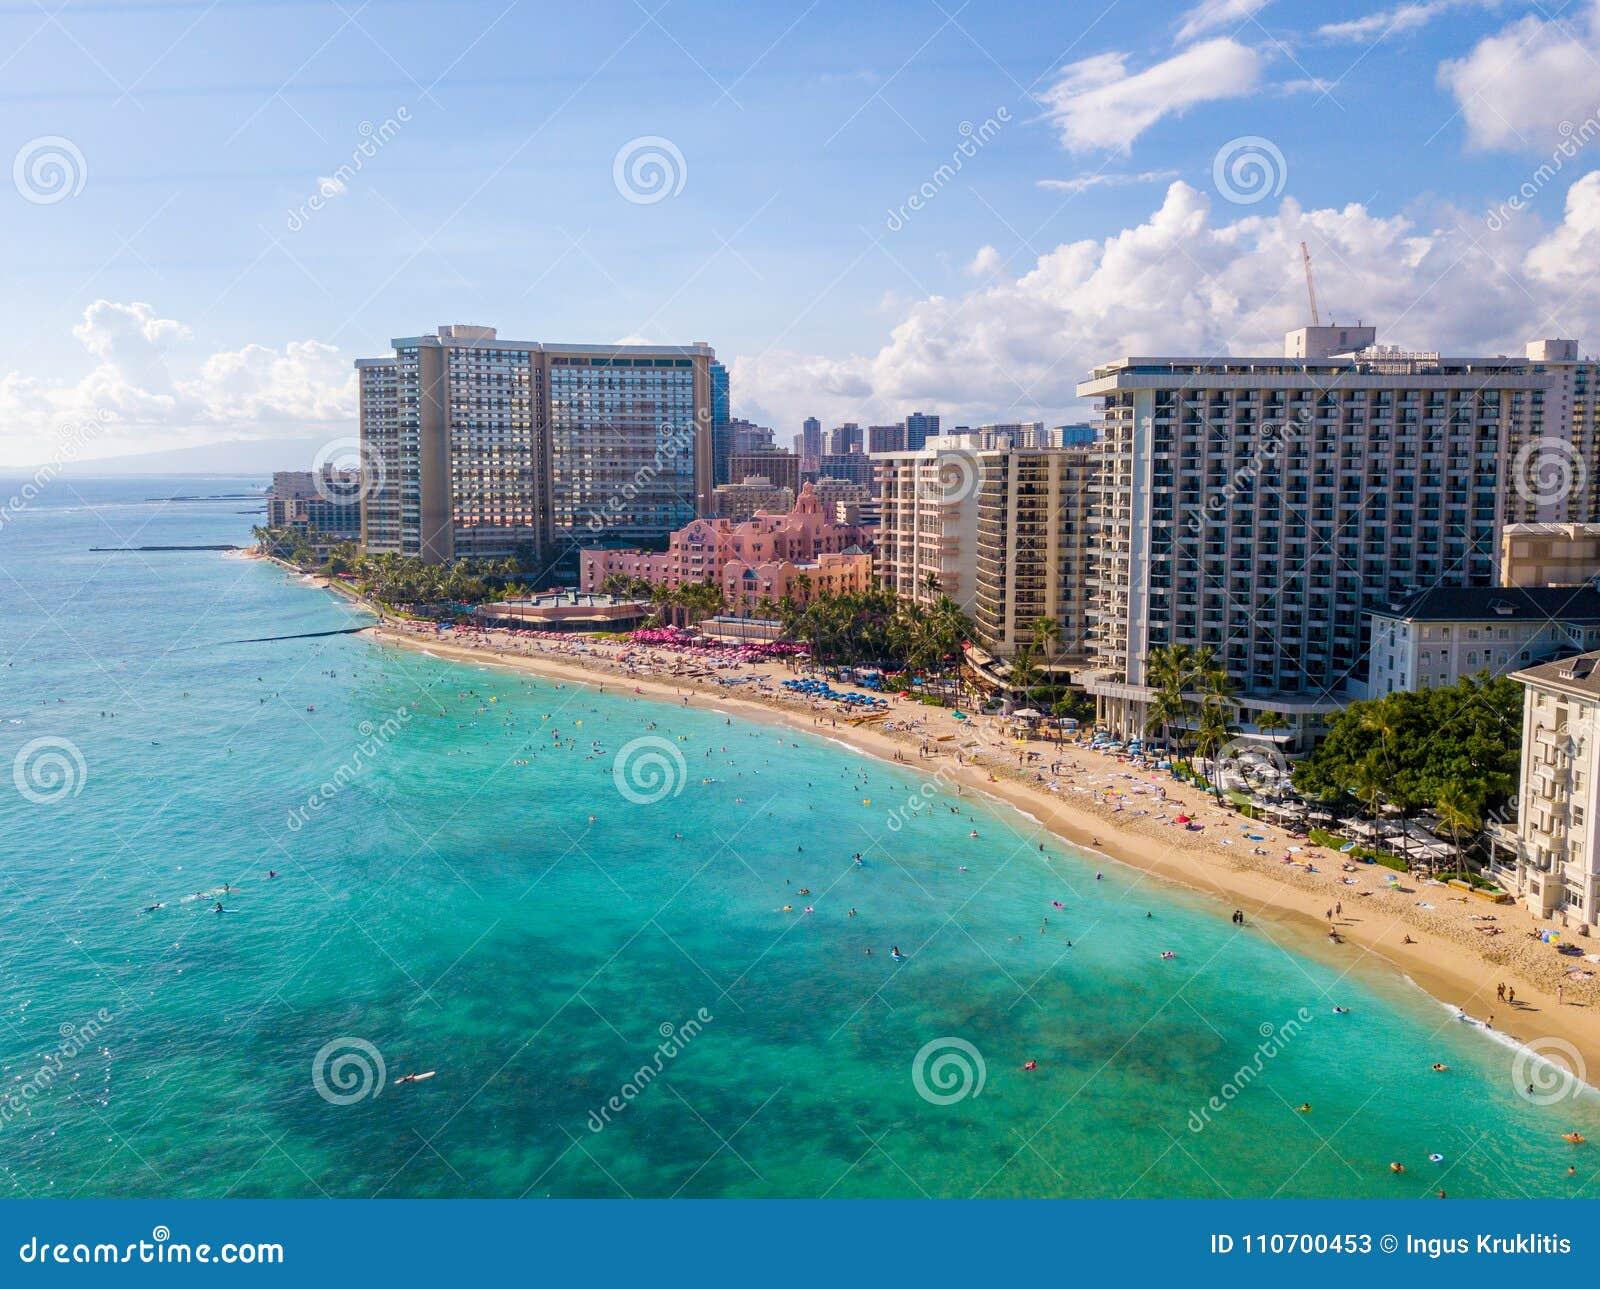 Aerial View Of Waikiki Beach And Diamond Head Crater Stock ...